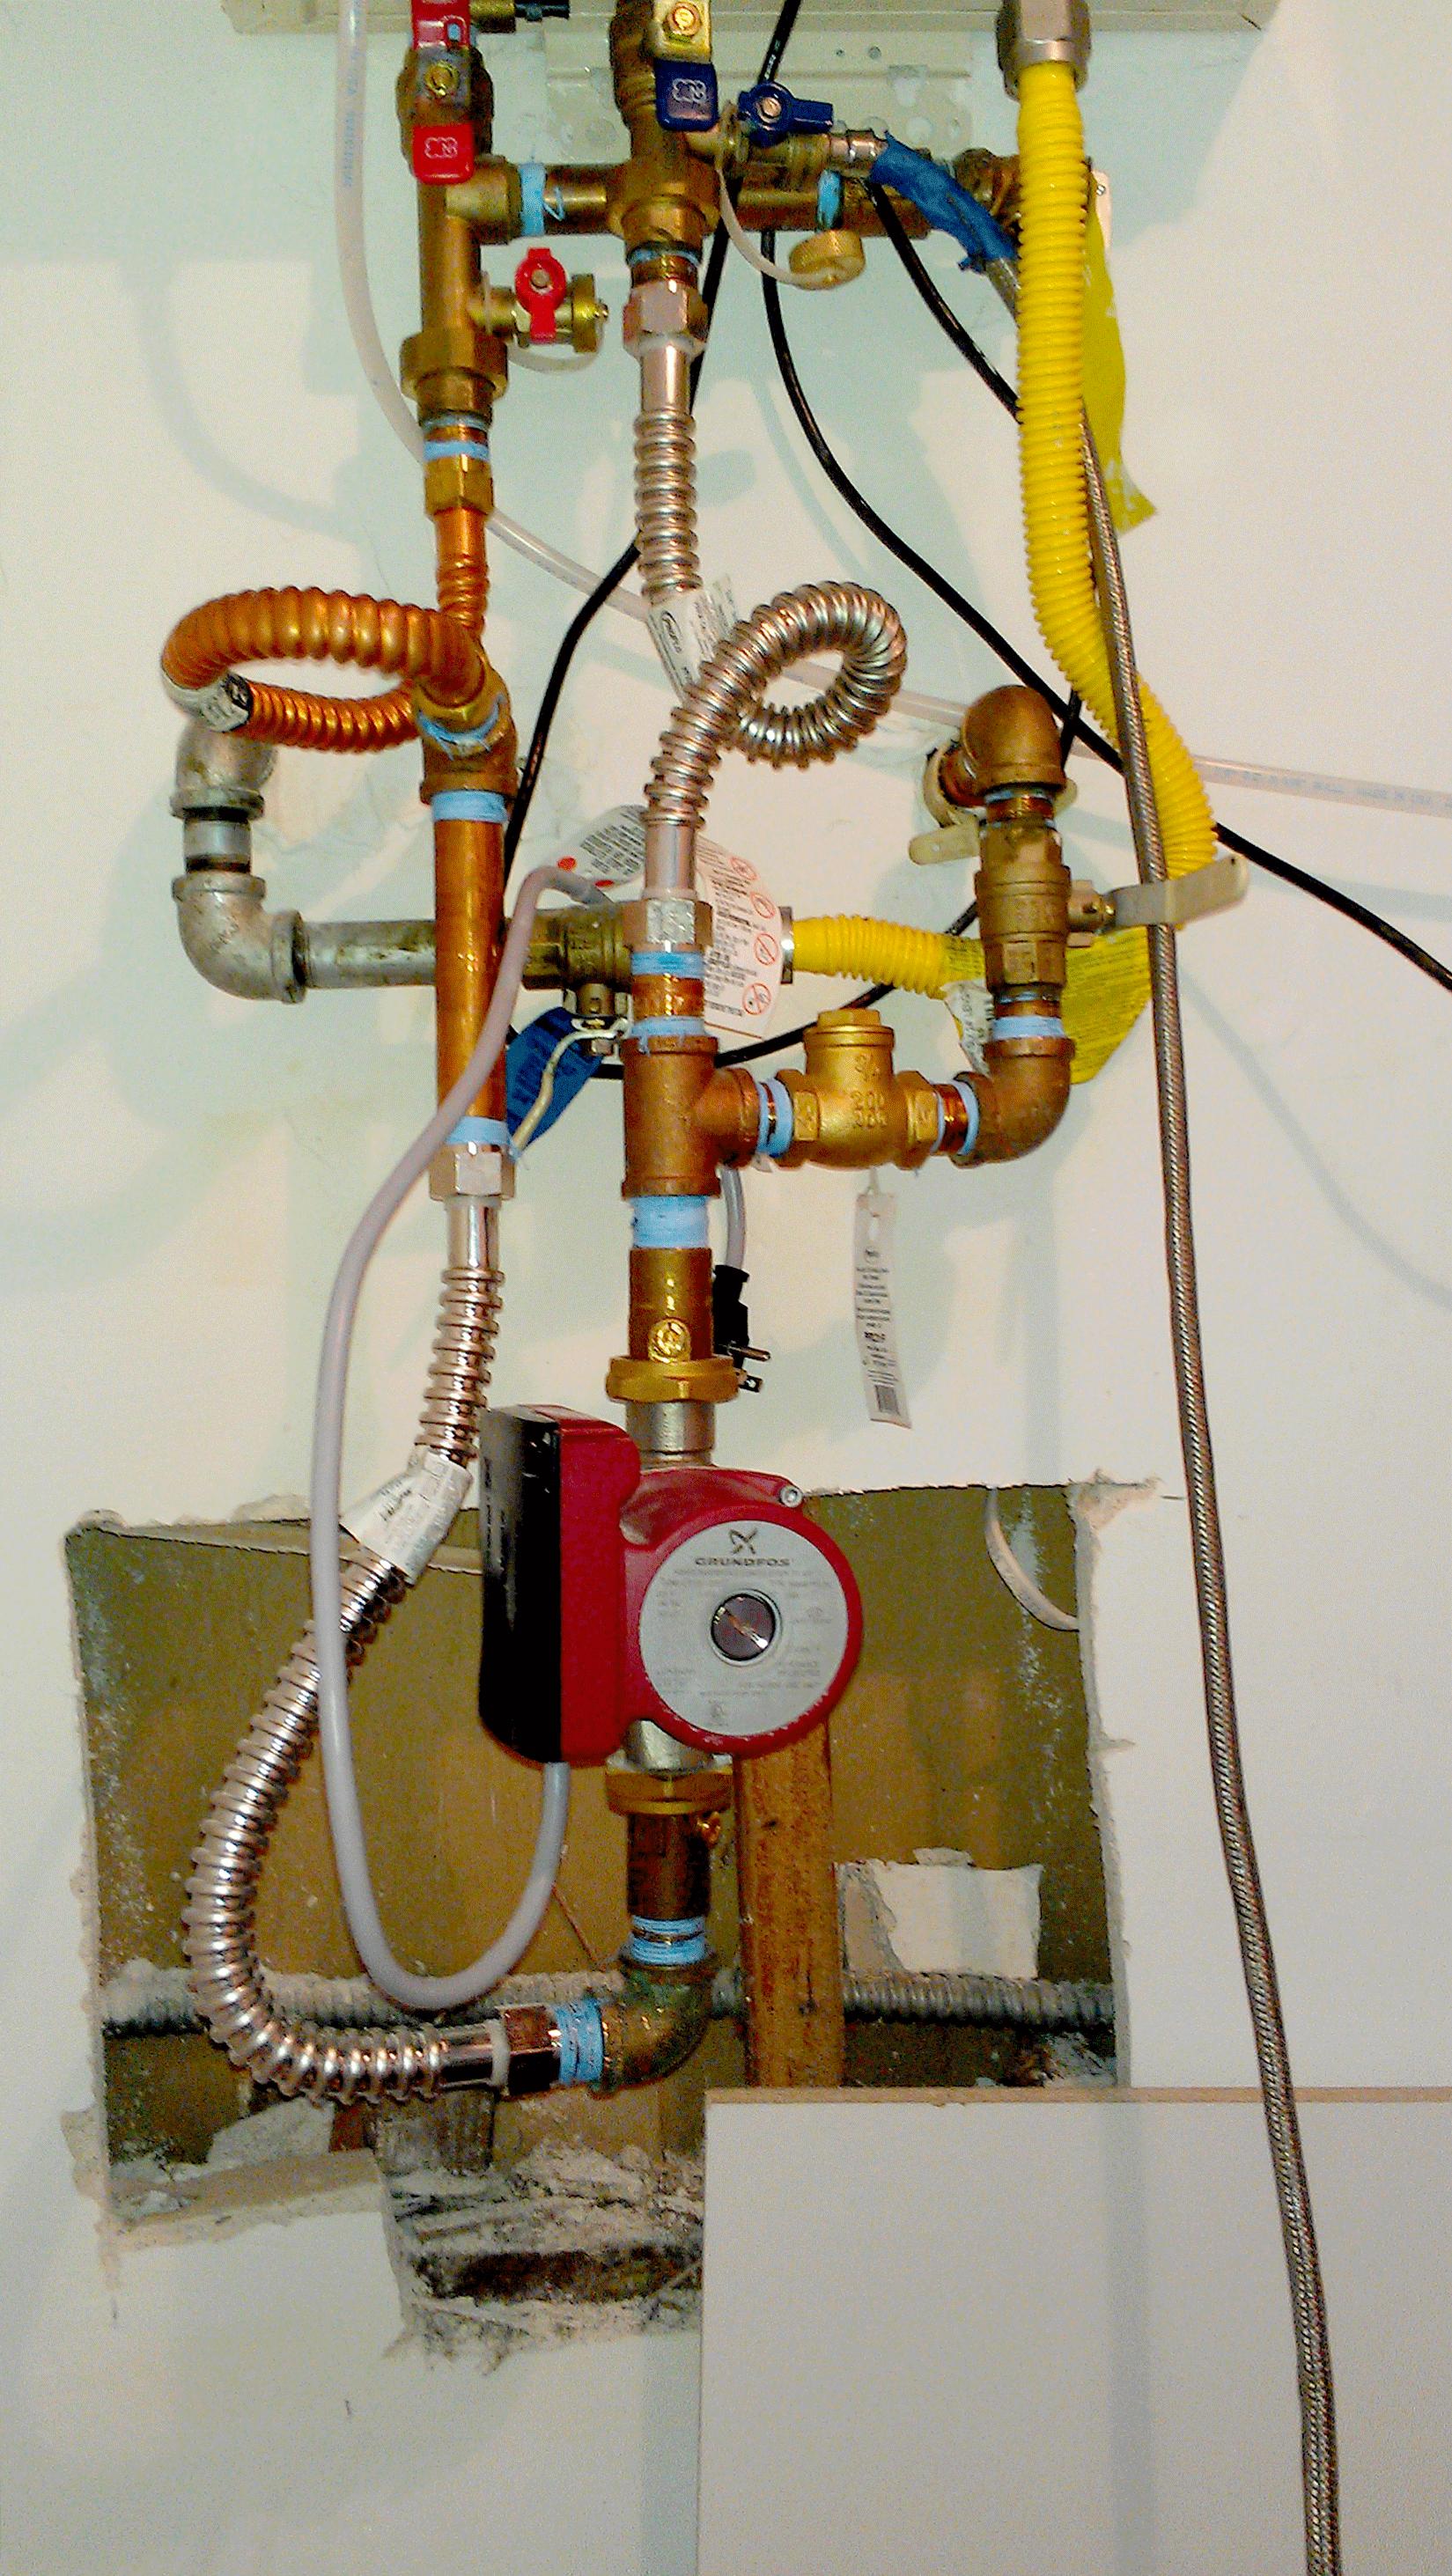 Noritz tankless water heater.